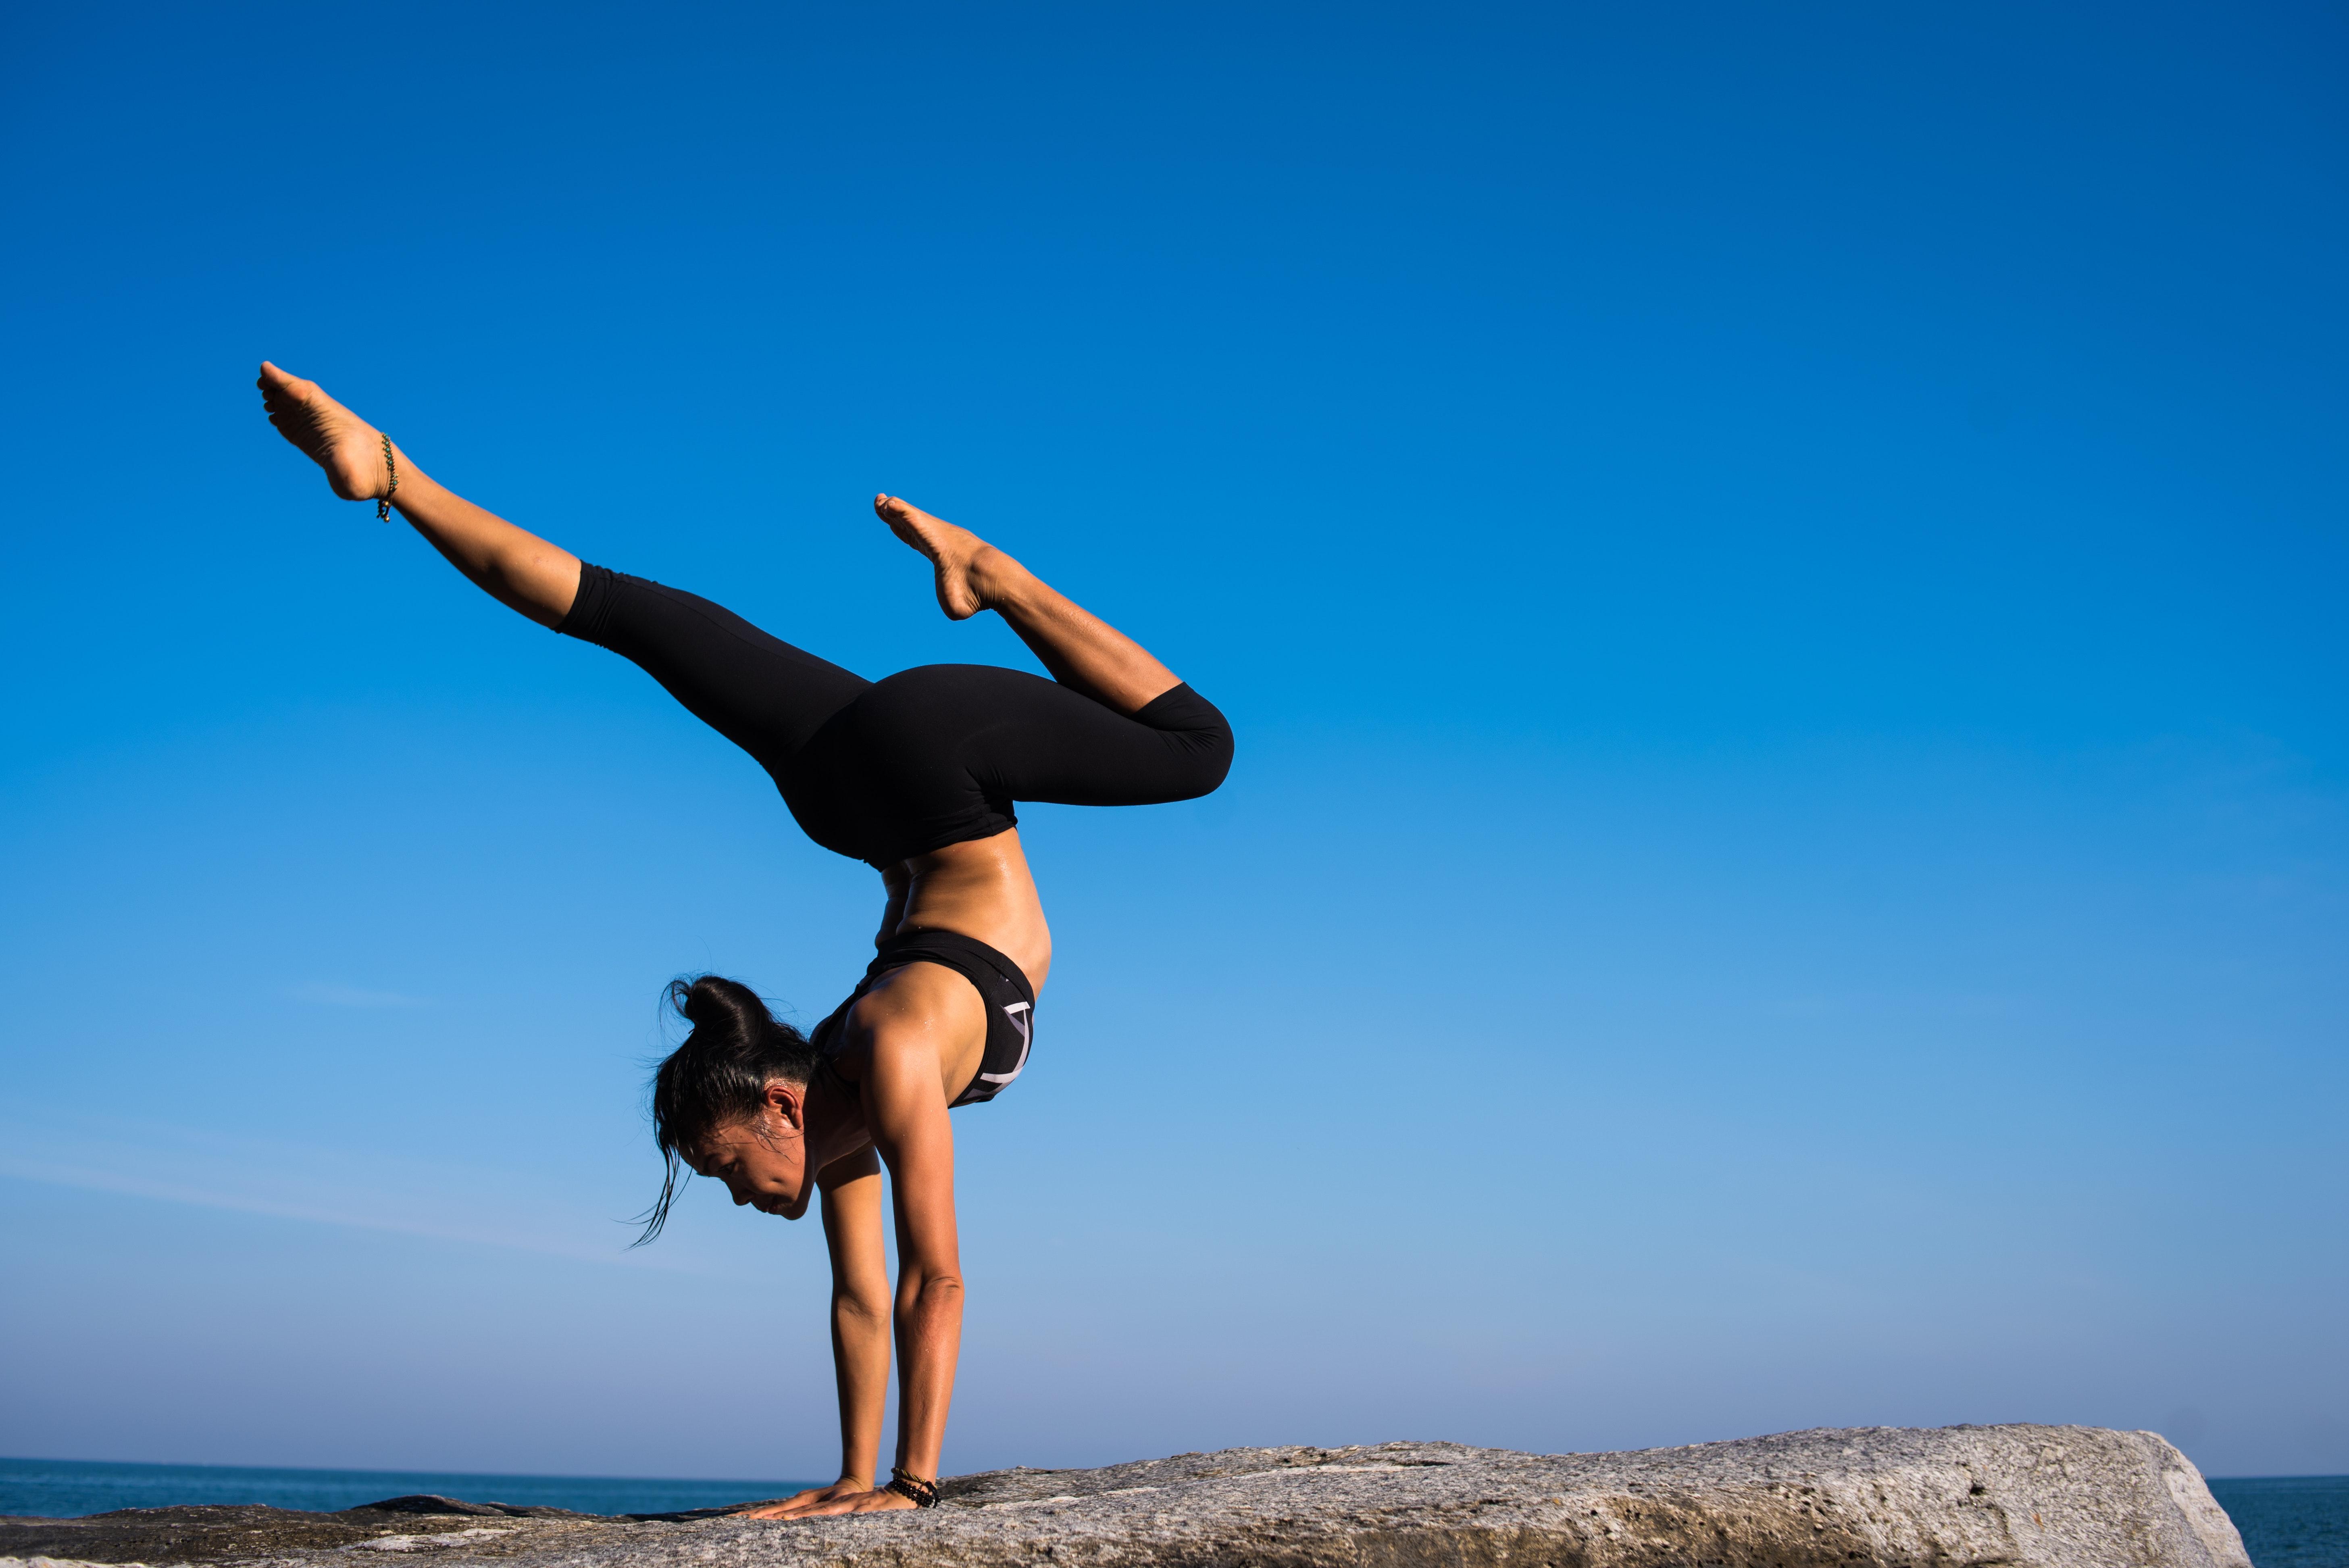 woman doing a yoga position